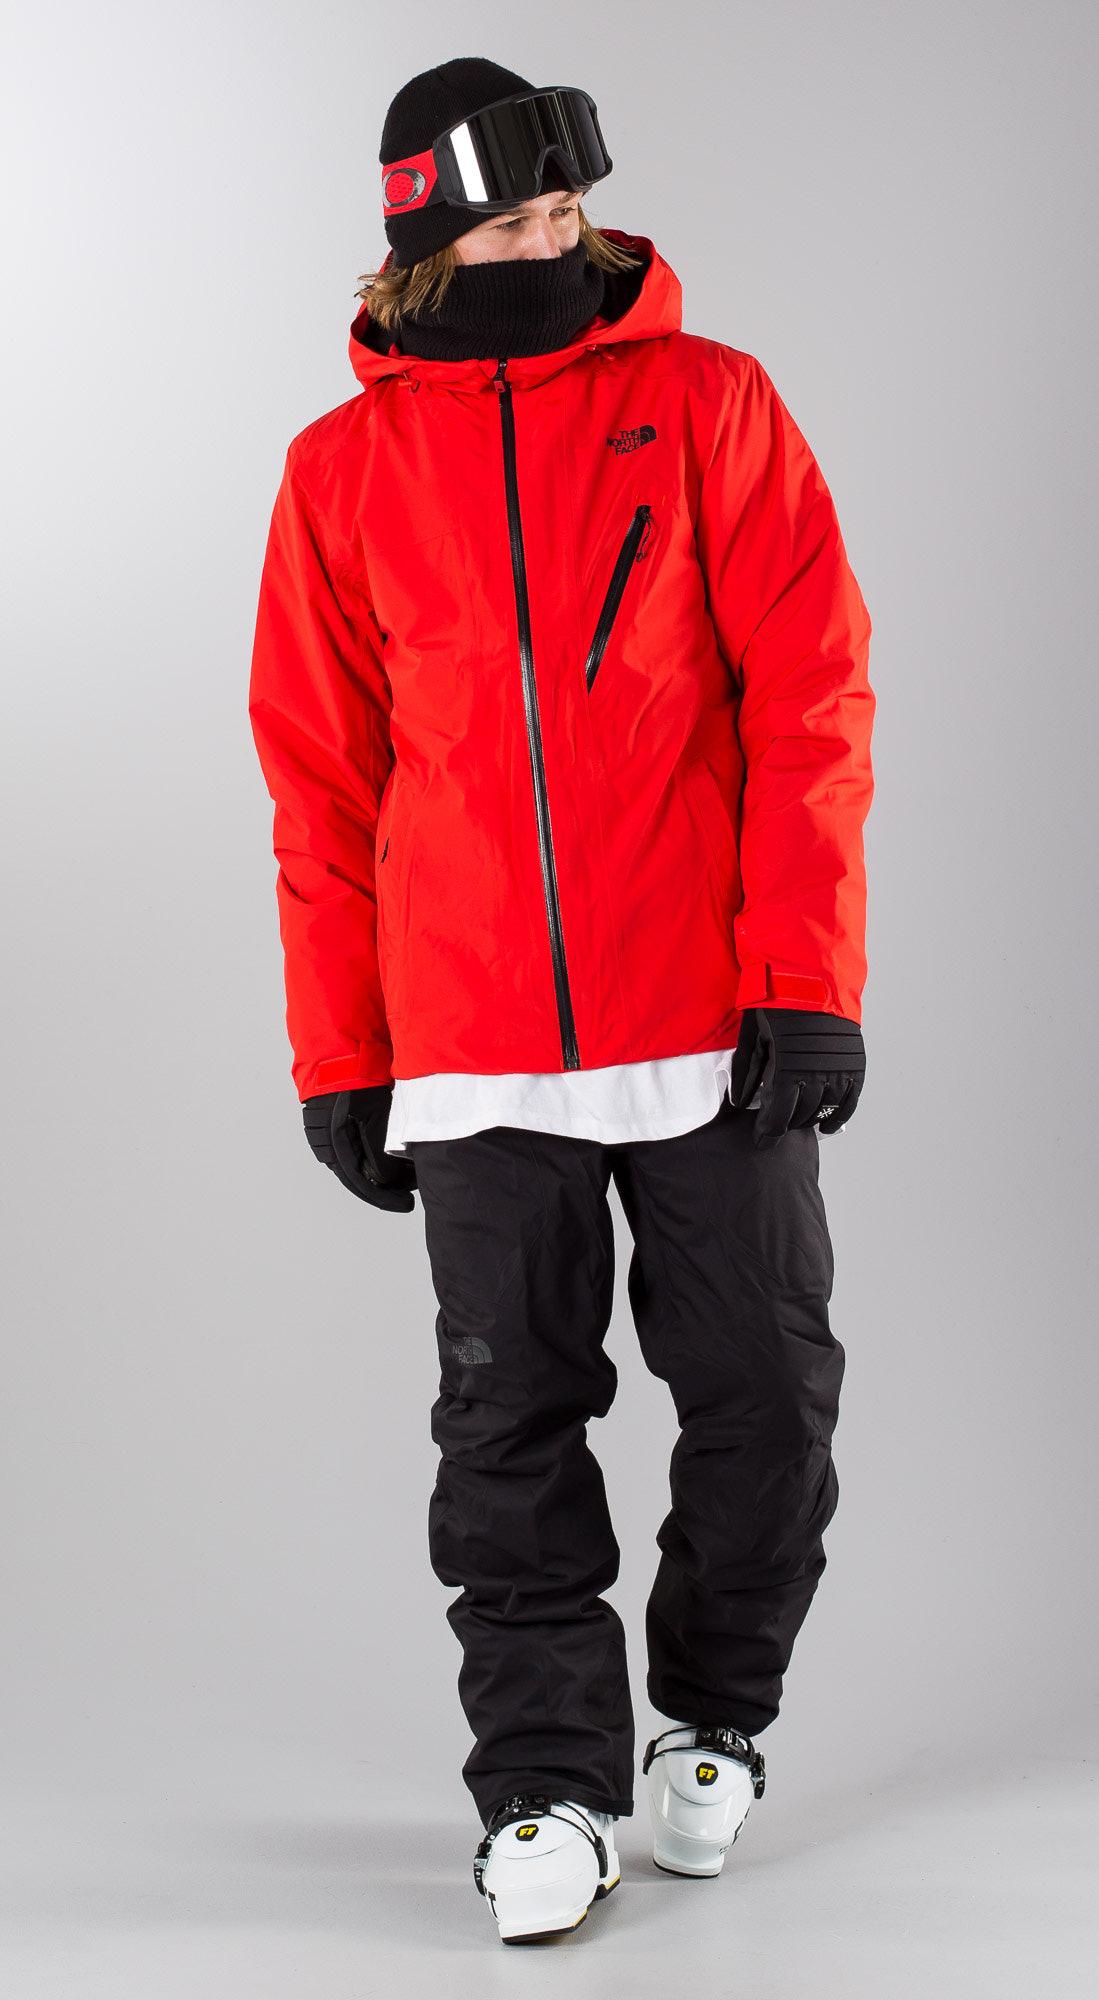 timeless design 03c52 c3edc Skibekleidung Herren Online Kaufen | Ridestore.de